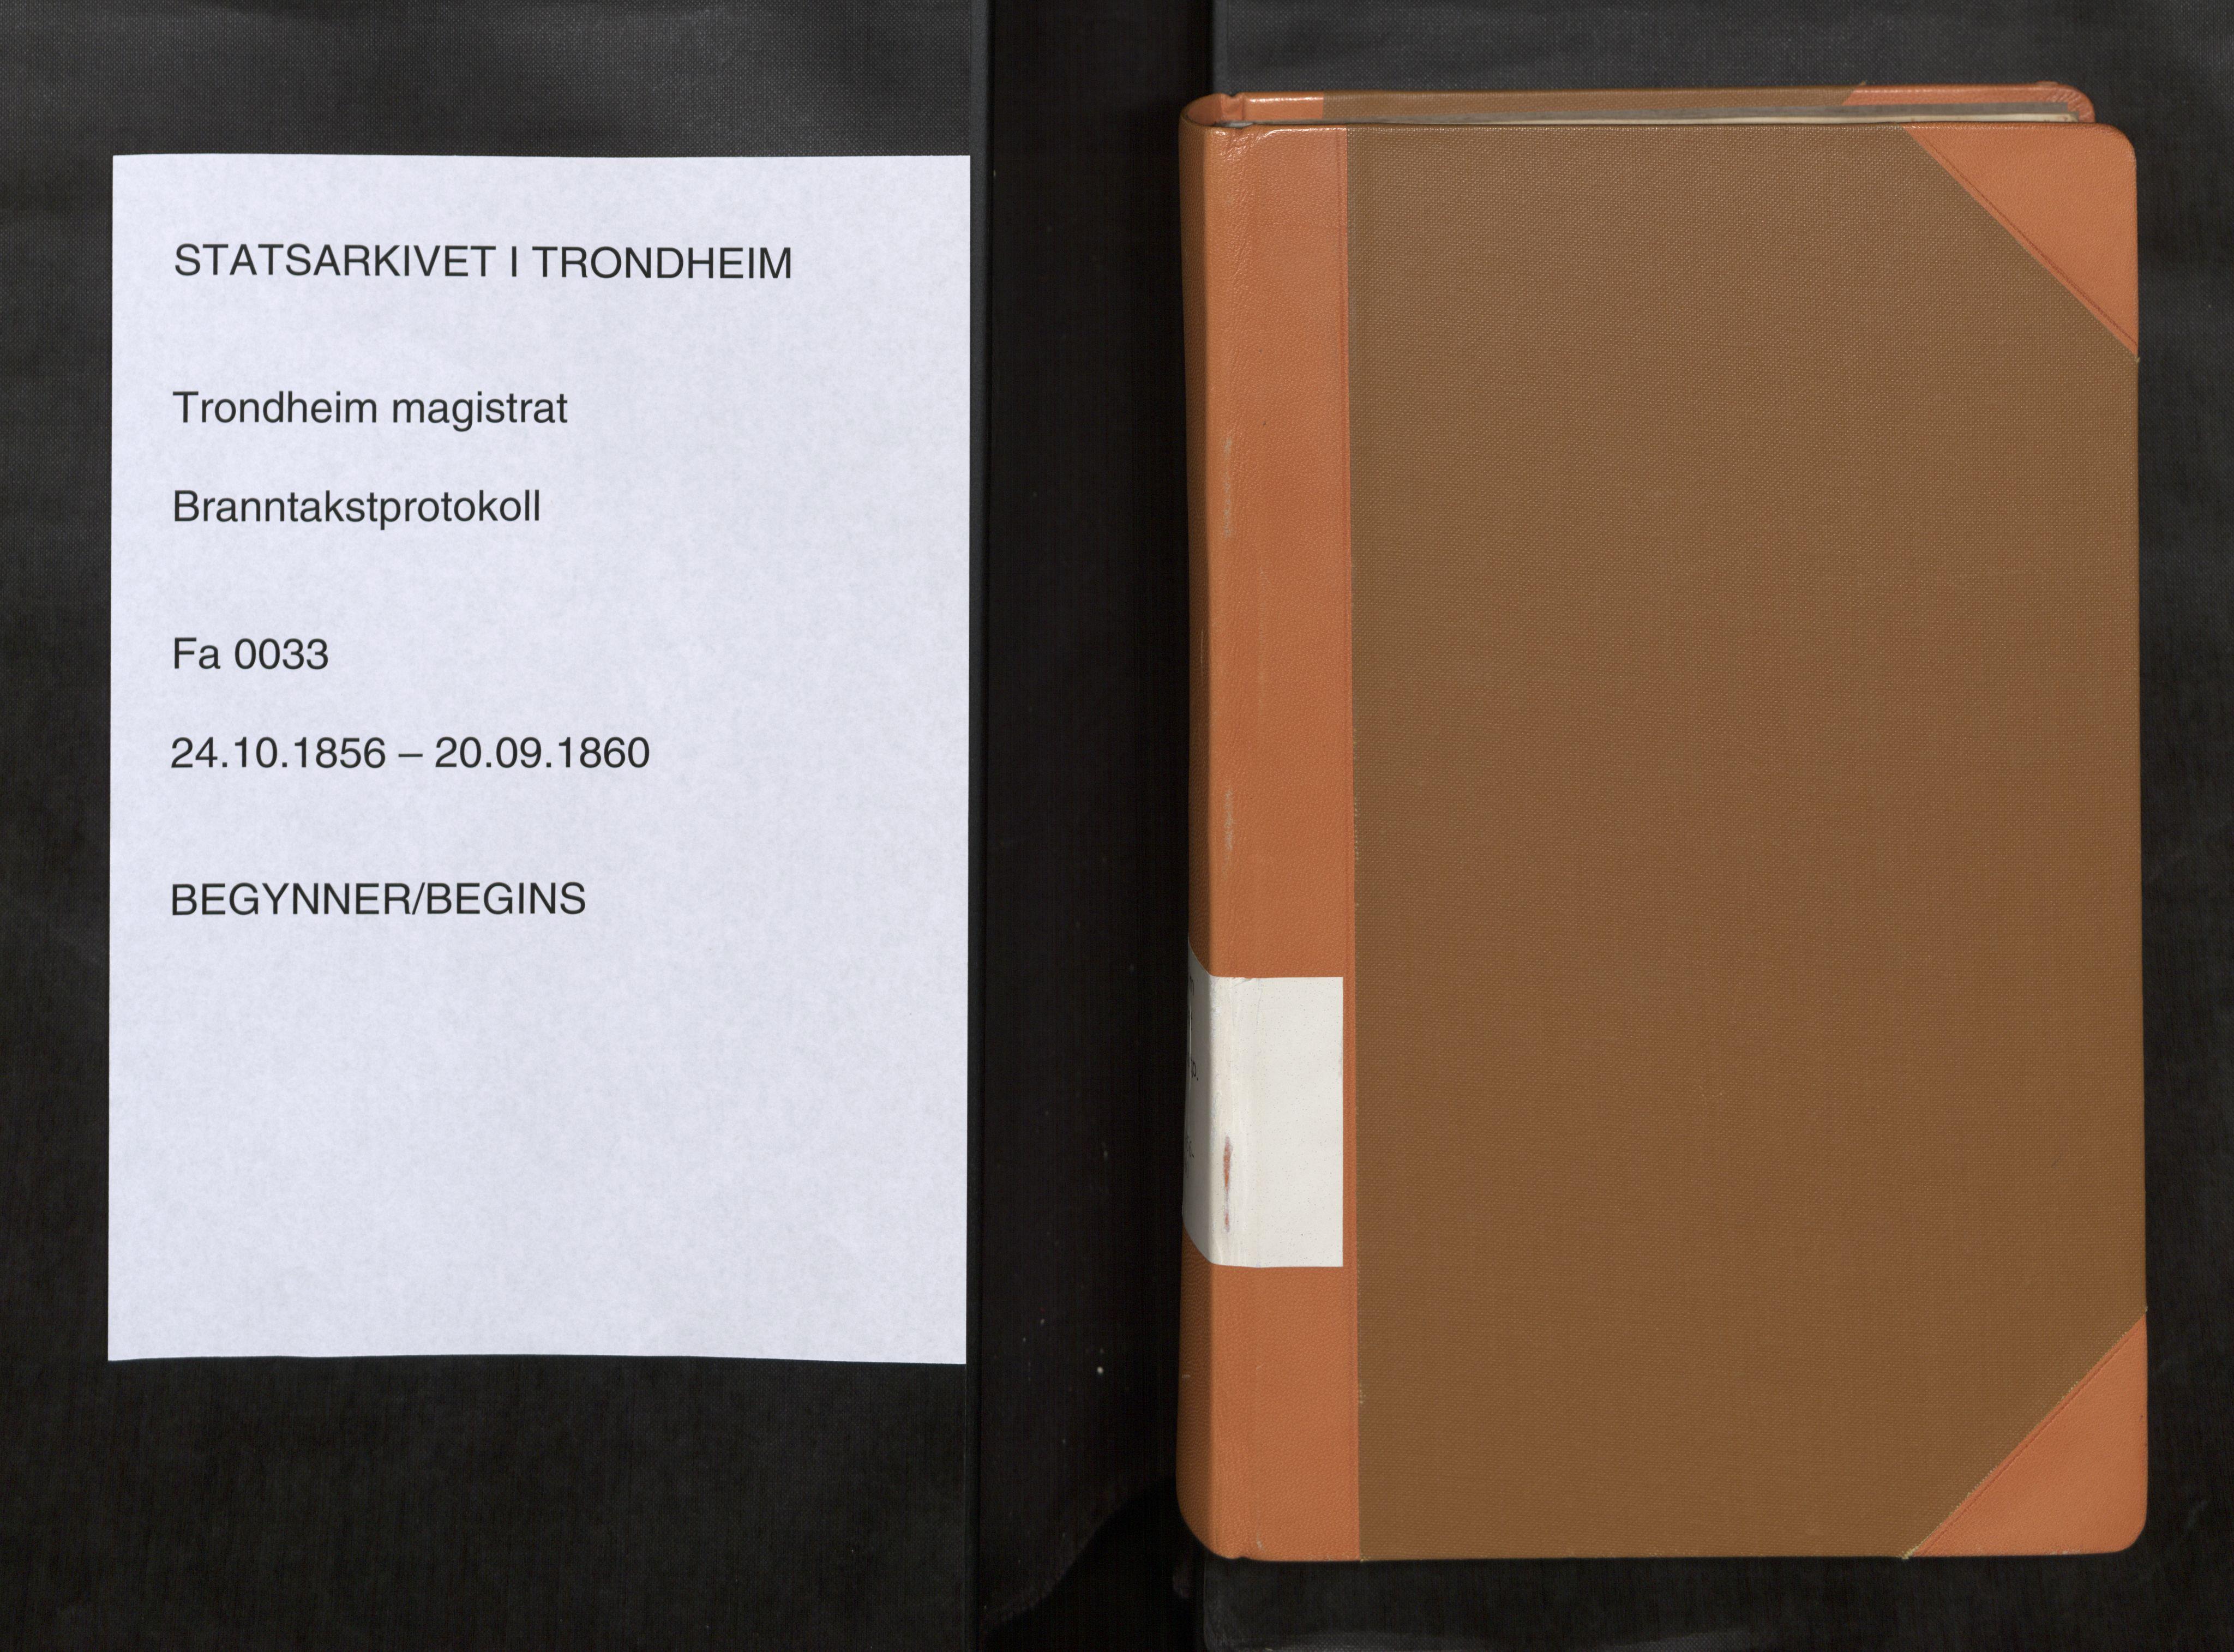 SAT, Norges Brannkasse Trondheim magistrat, Fa/L0036: Branntakstprotokoll, 1856-1860